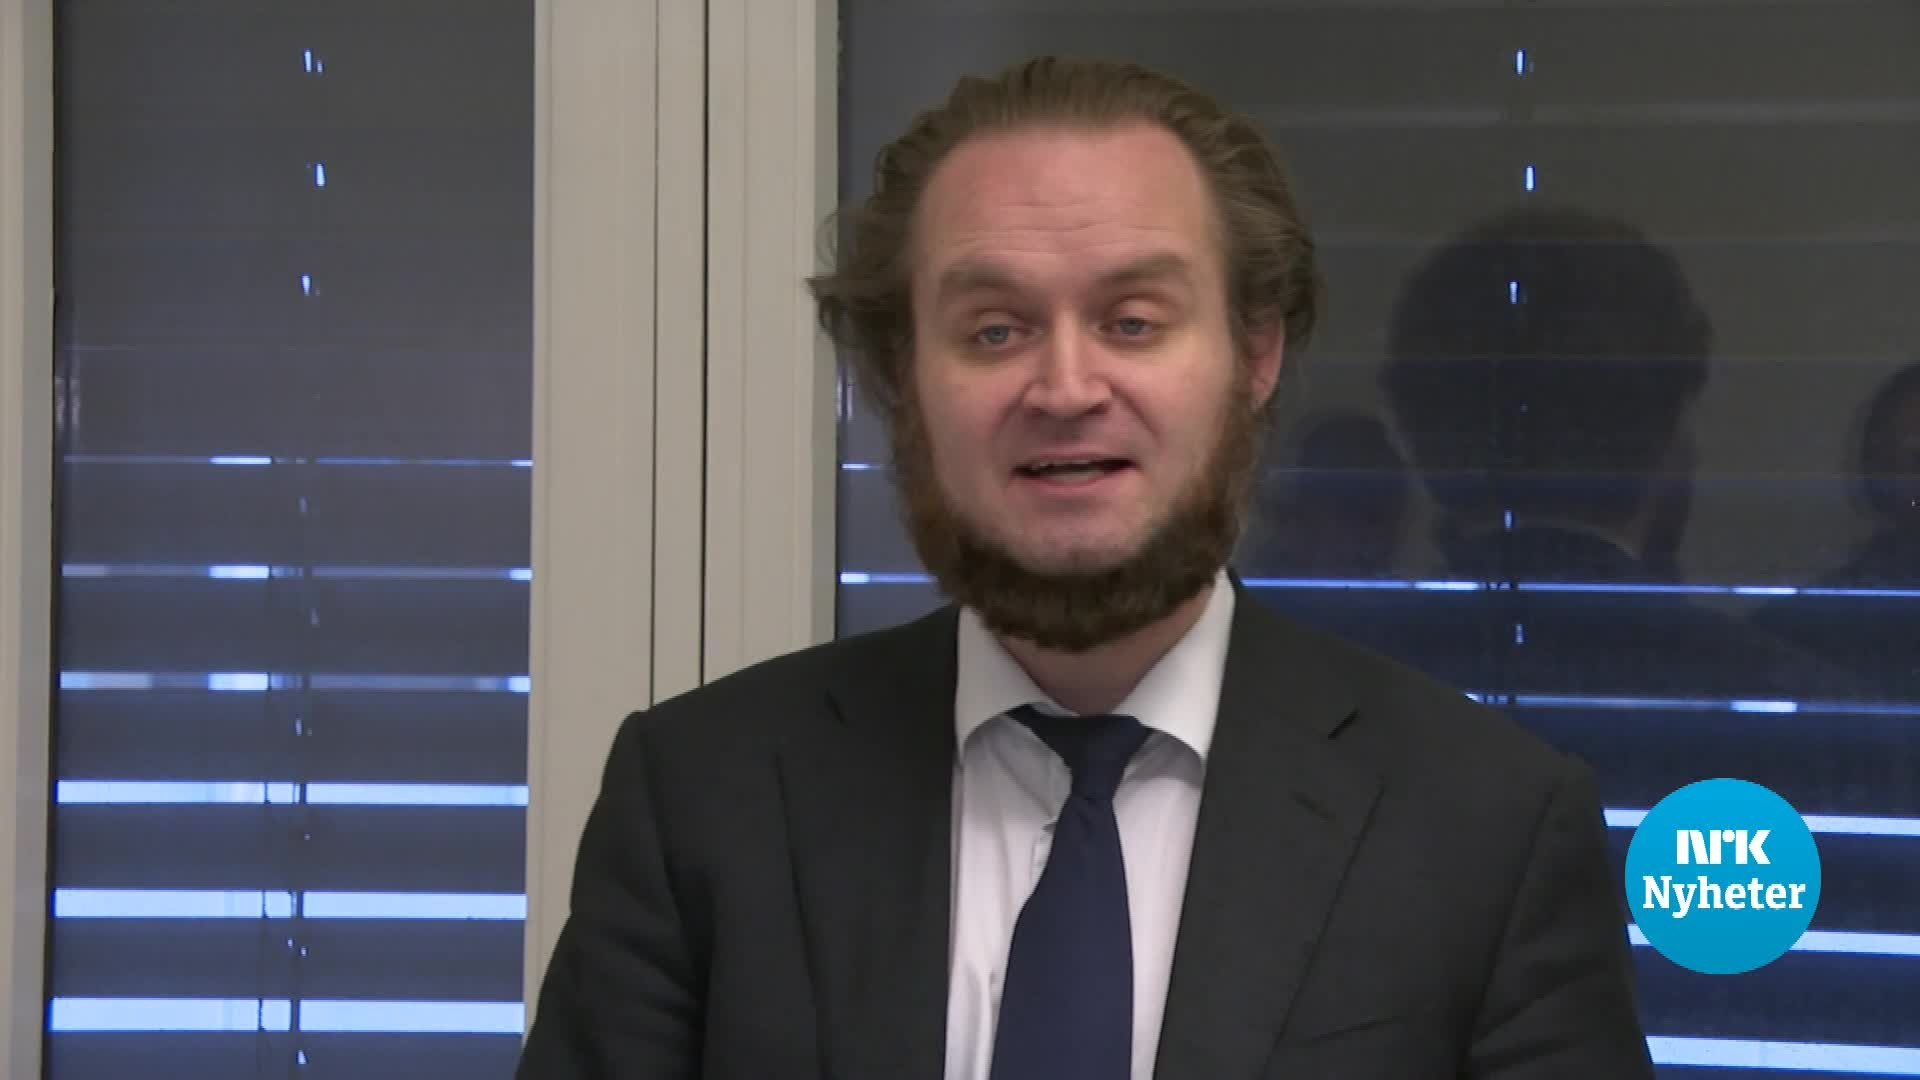 Nils Kristian Nordhus